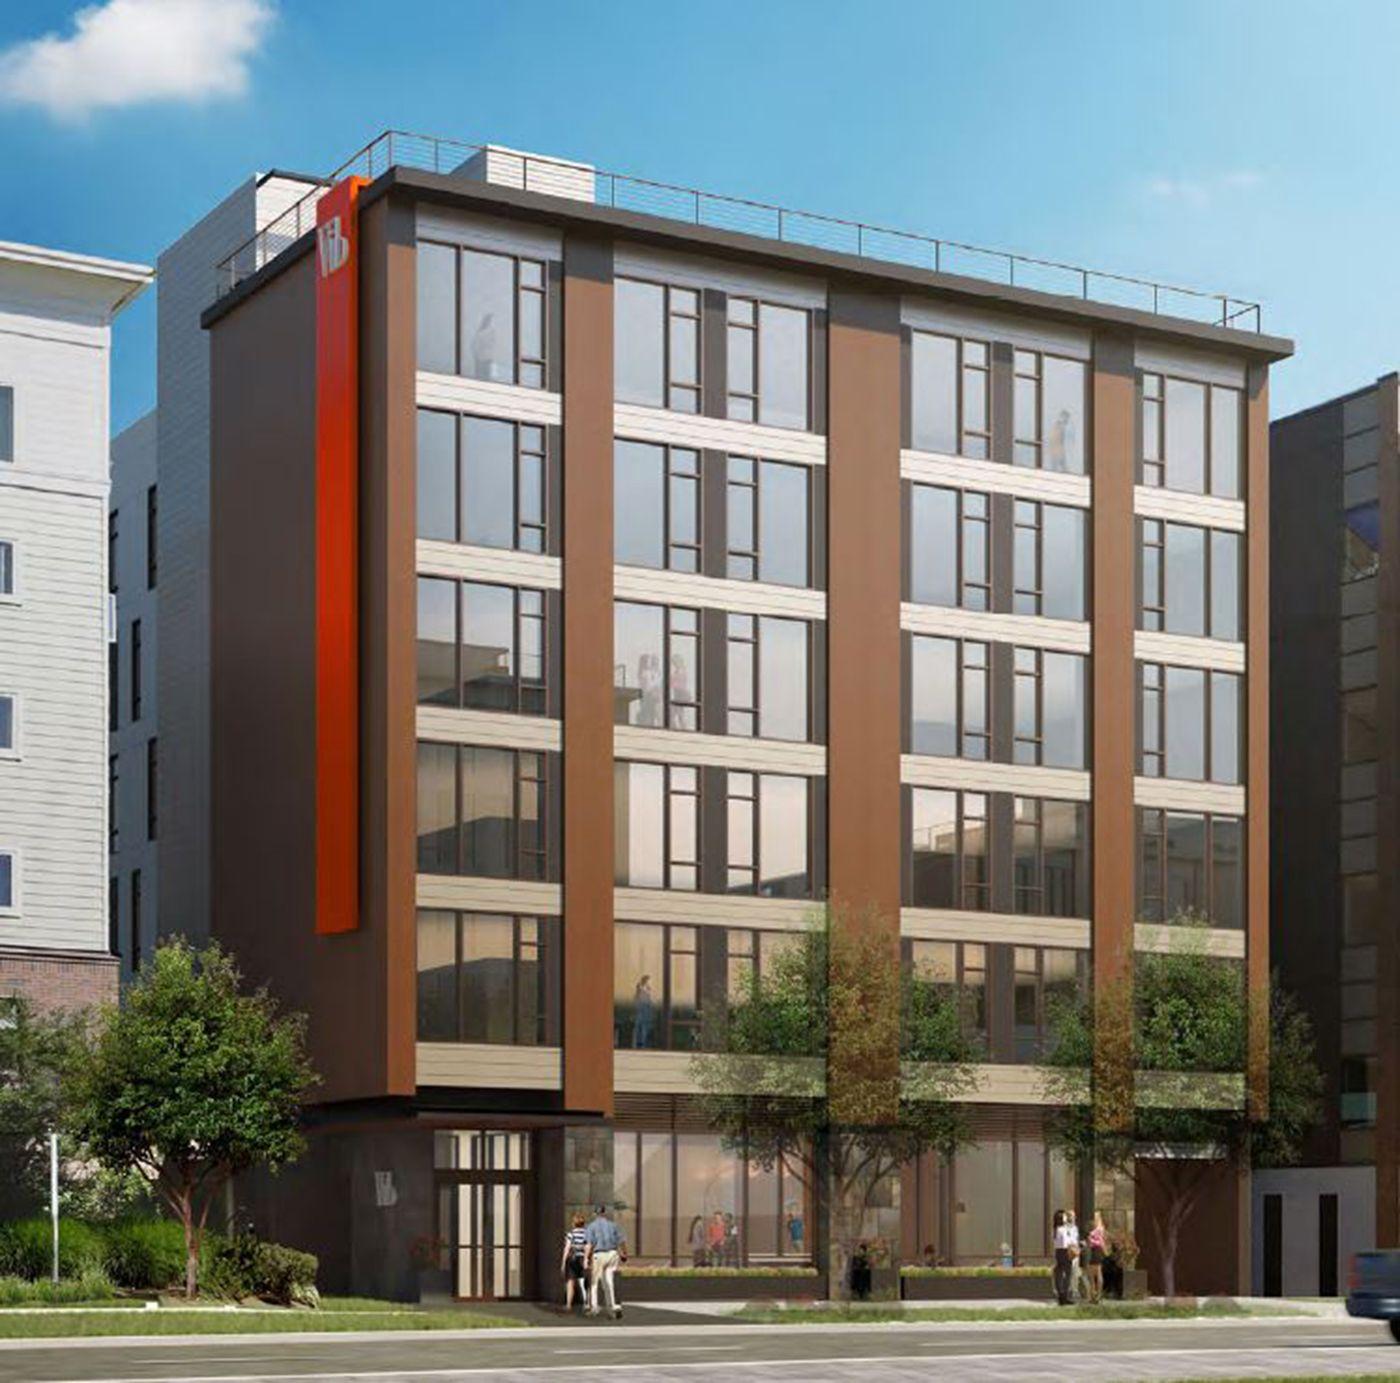 Capitol Hill Project Will Mix Housing, Vib Hotel Vib Is A